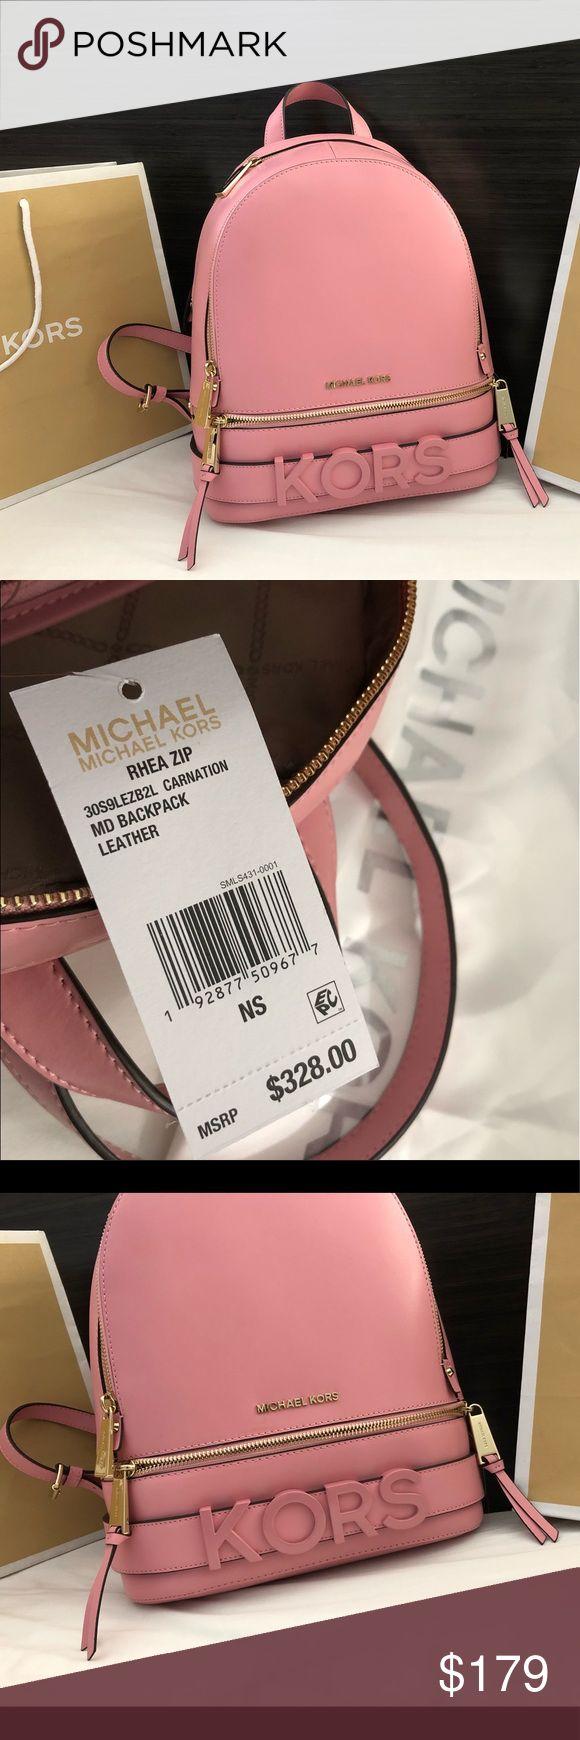 Neu $ 328 Michael Kors Rhea Rucksack MK Handtaschen Tasche ⏳⏳⏳LAST 1! 🔥🔥🔥 …